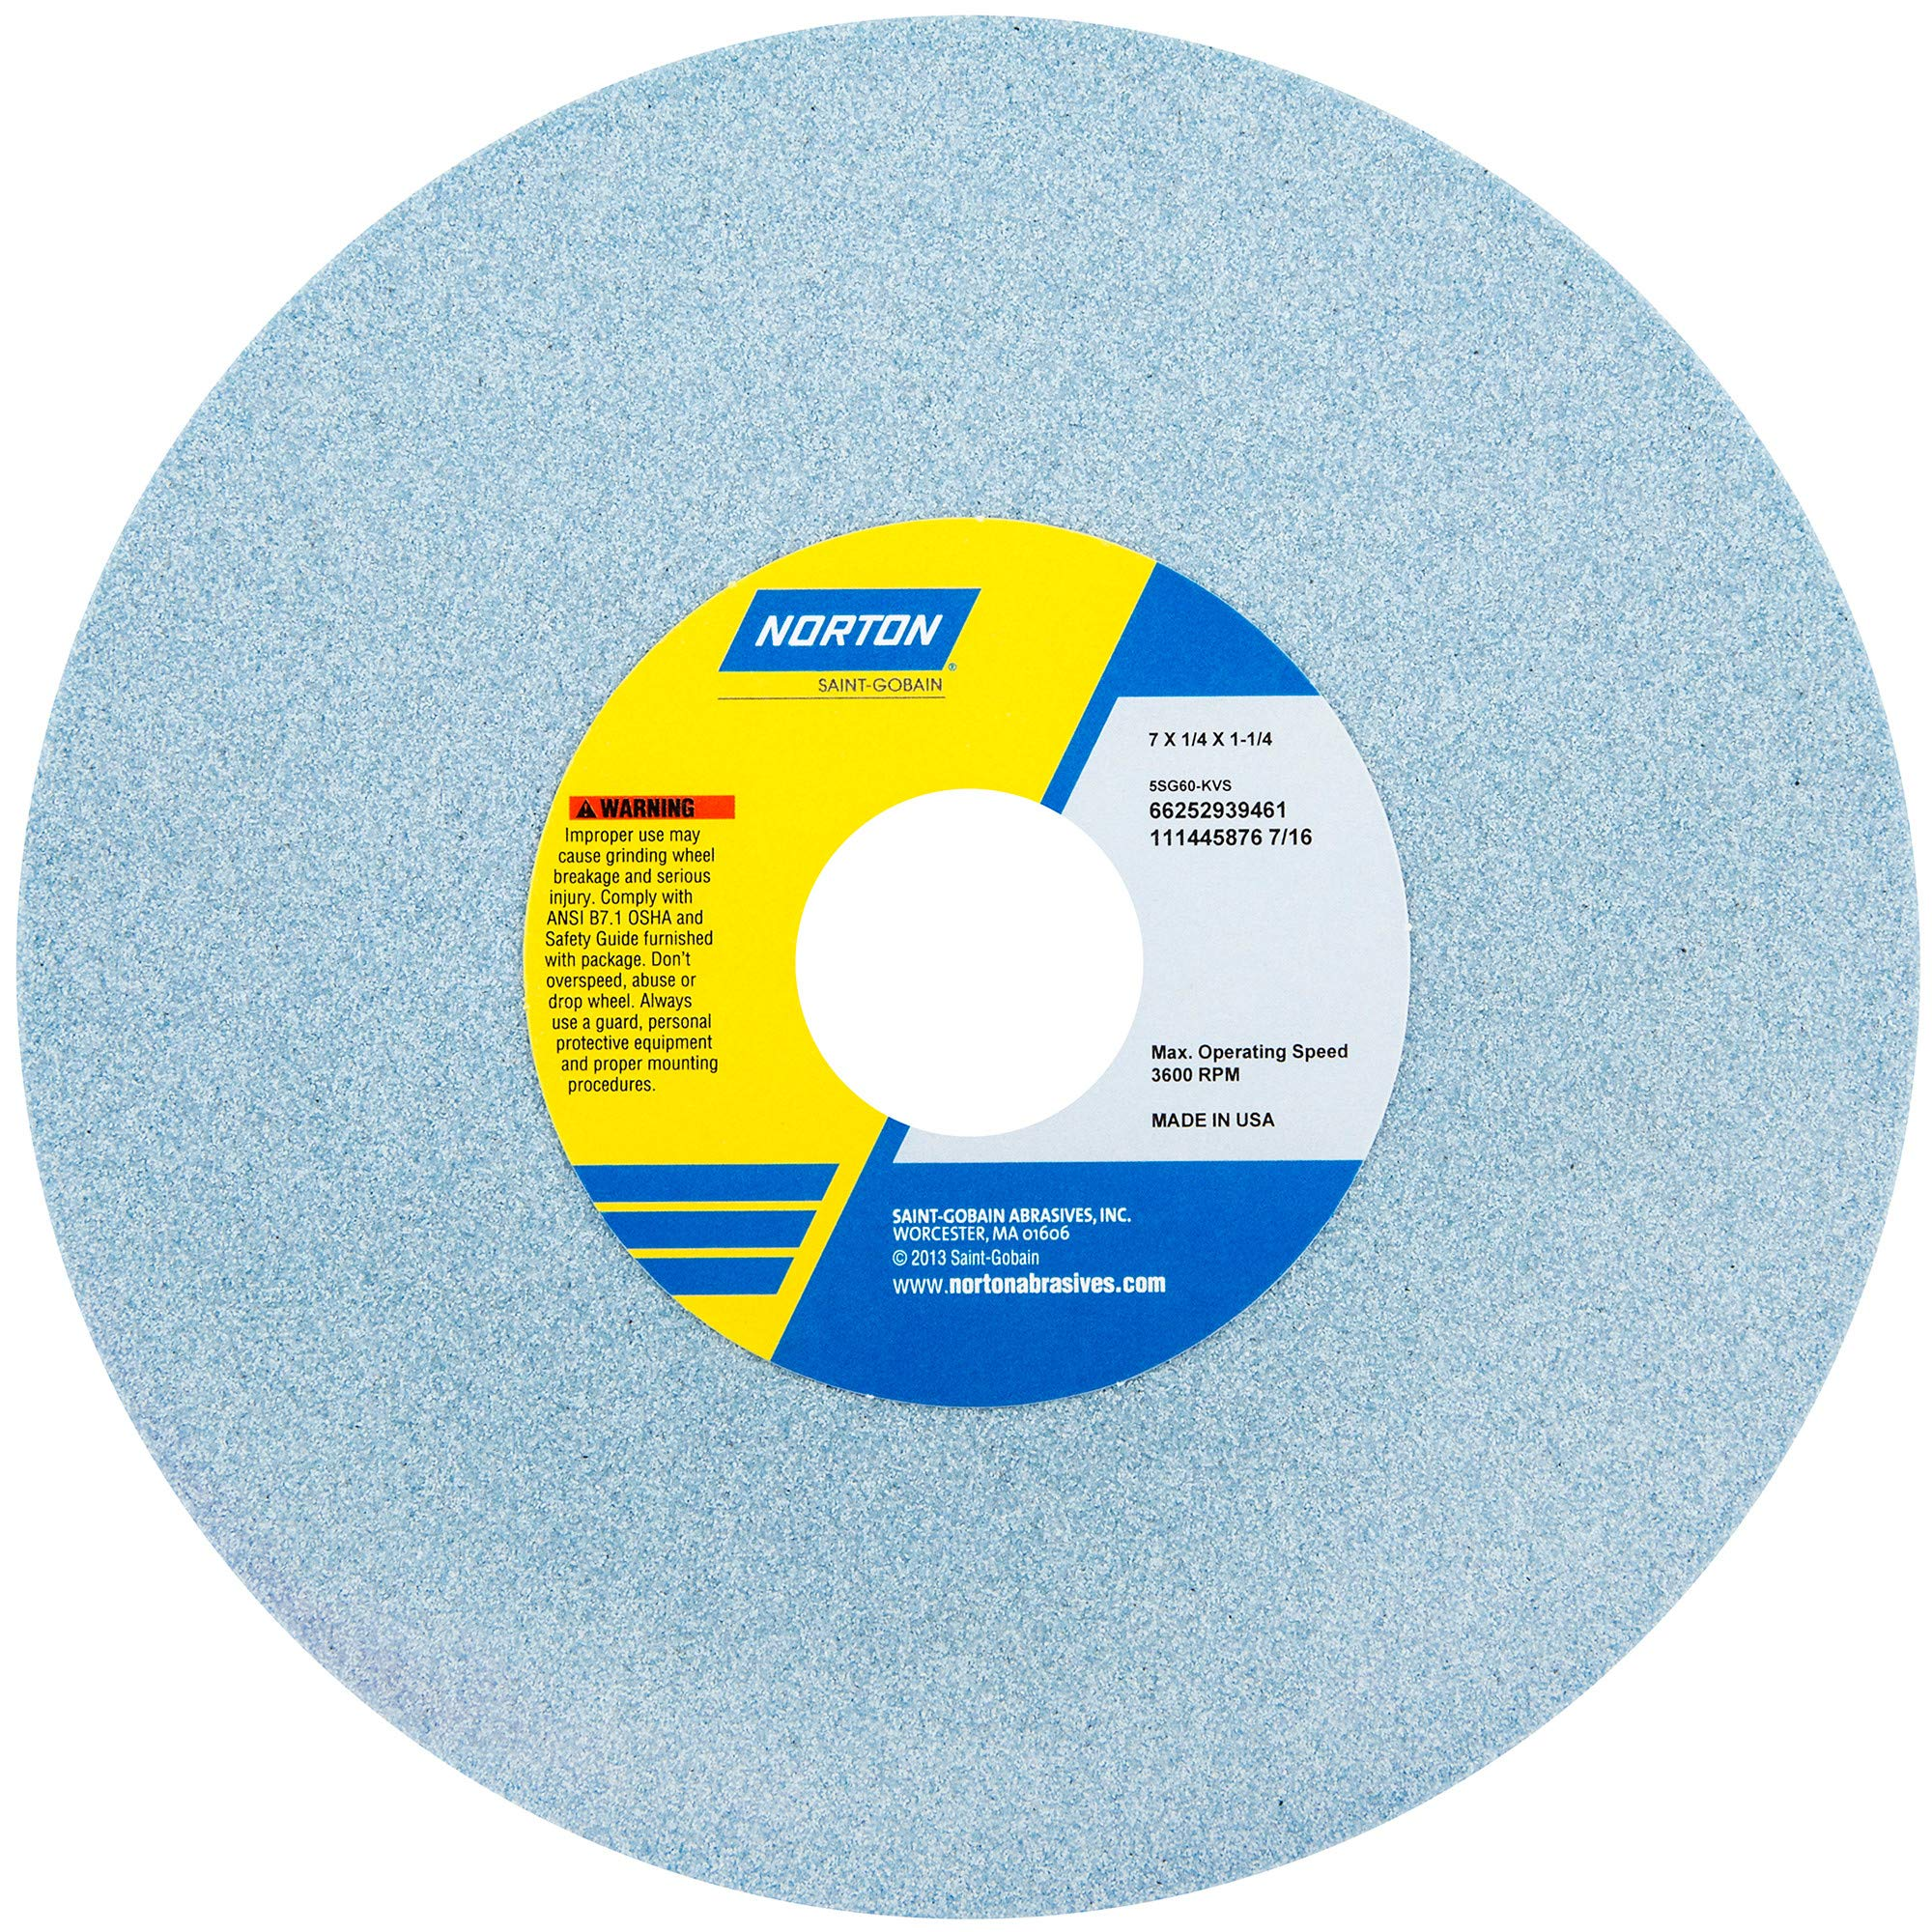 Norton 5SG60-KVS Type 01 Vitrified Straight Toolroom Grinding Wheel, Ceramic Alumina, 7'' Diameter x 1/4'' Width, 1-1/4'' Arbor, 60 Grit, Grade K, Blue (Pack of 1)